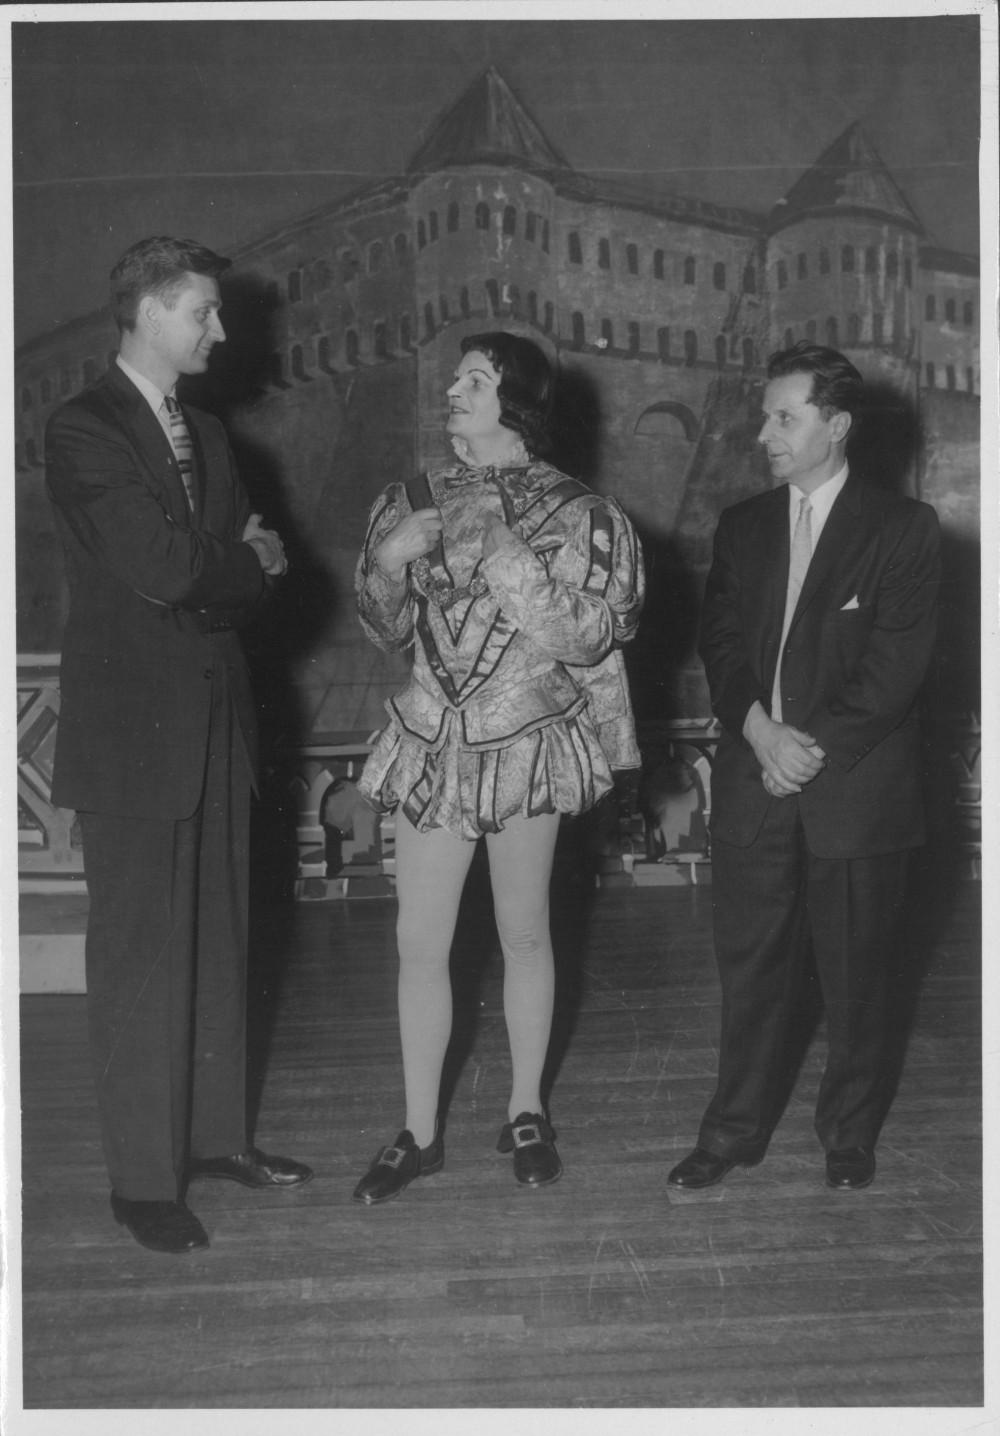 "Po spektaklio ""Vėjas gluosniuose"" premjeros Čikagoje. A. Landsbergis, rež. A. Dikinis, dail. A. Valeška. 1958 m. gegužės 10 d."